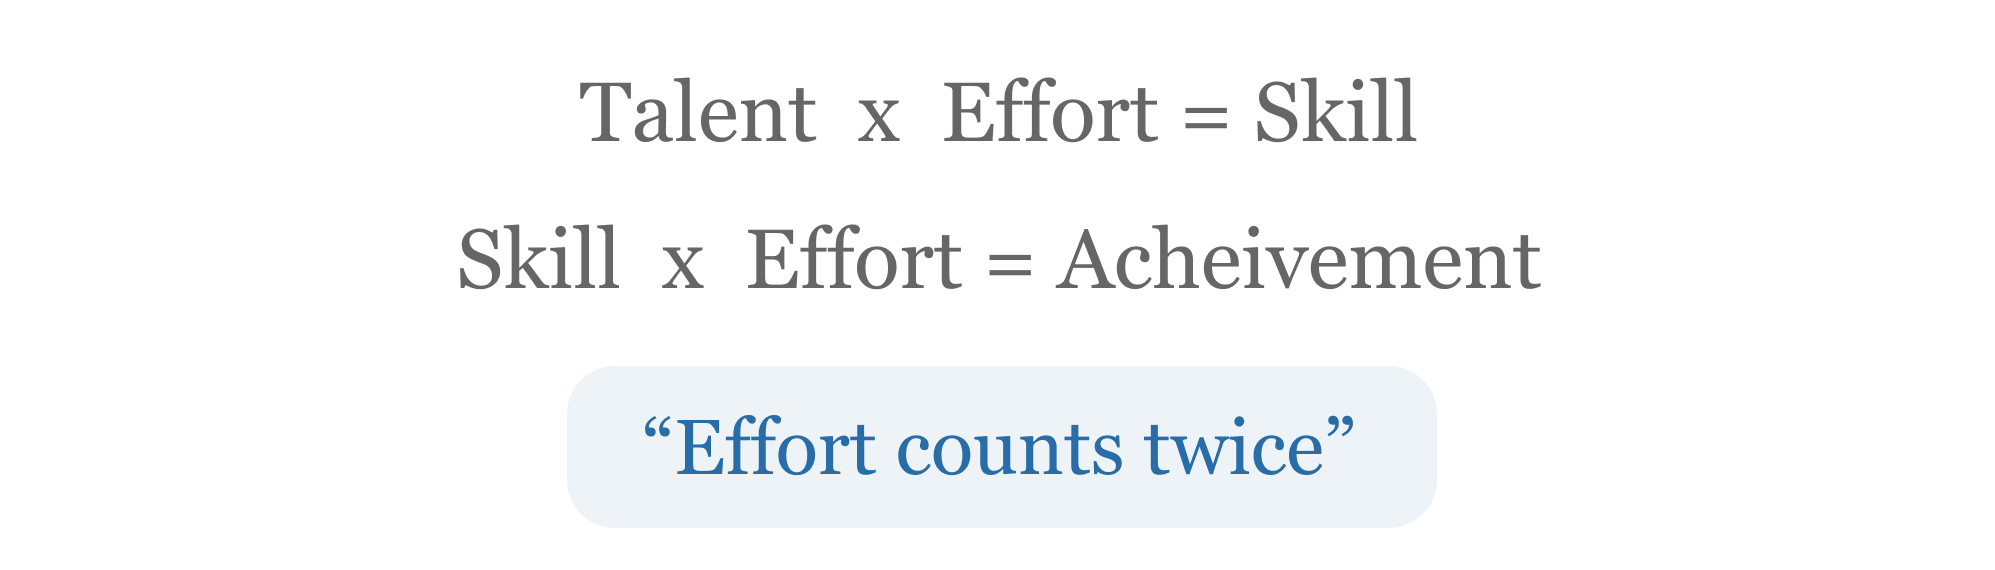 Grit equation. Effort counts twice.